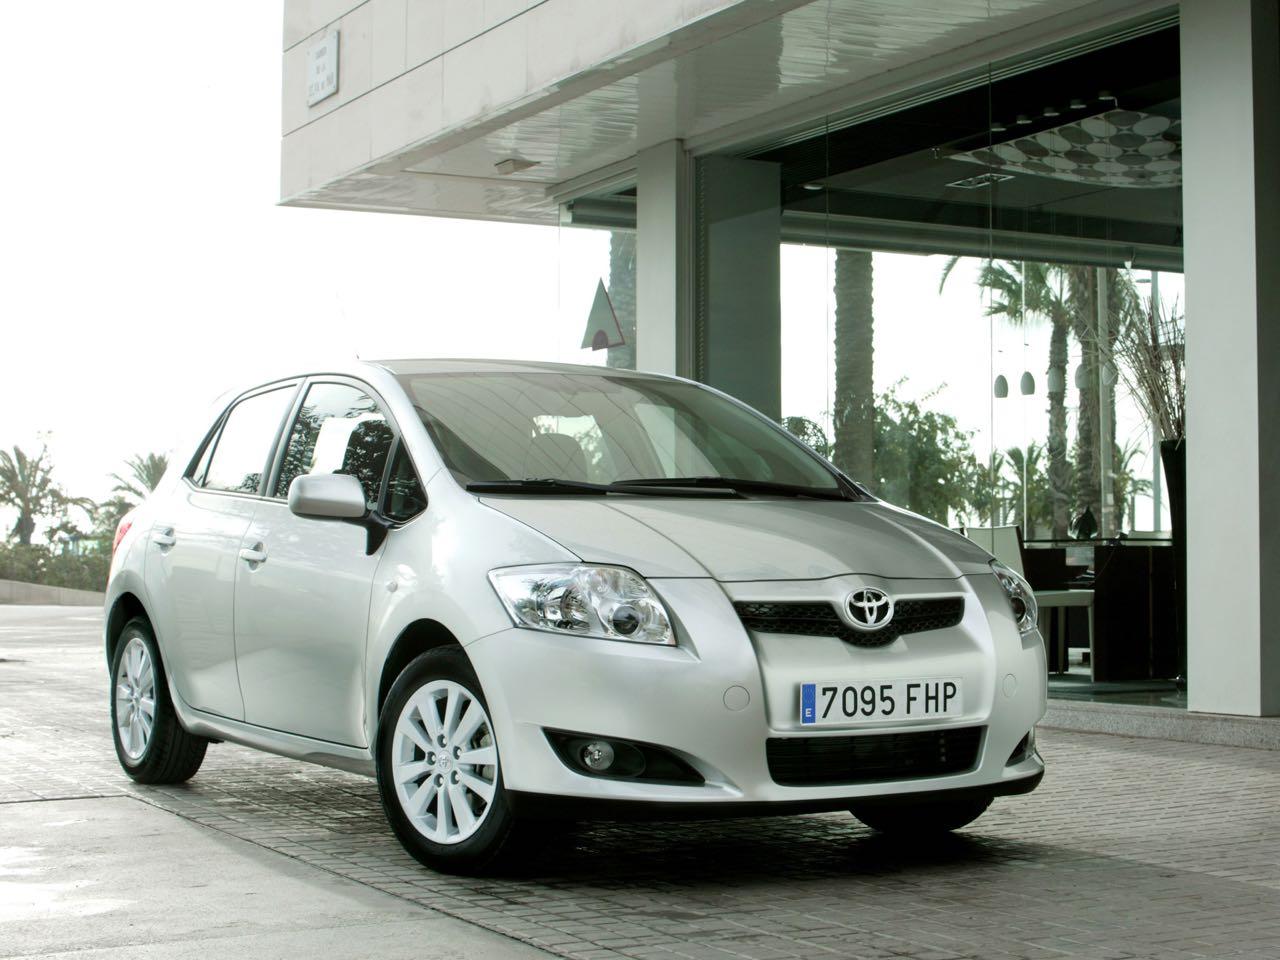 Toyota Auris 2007 – 4